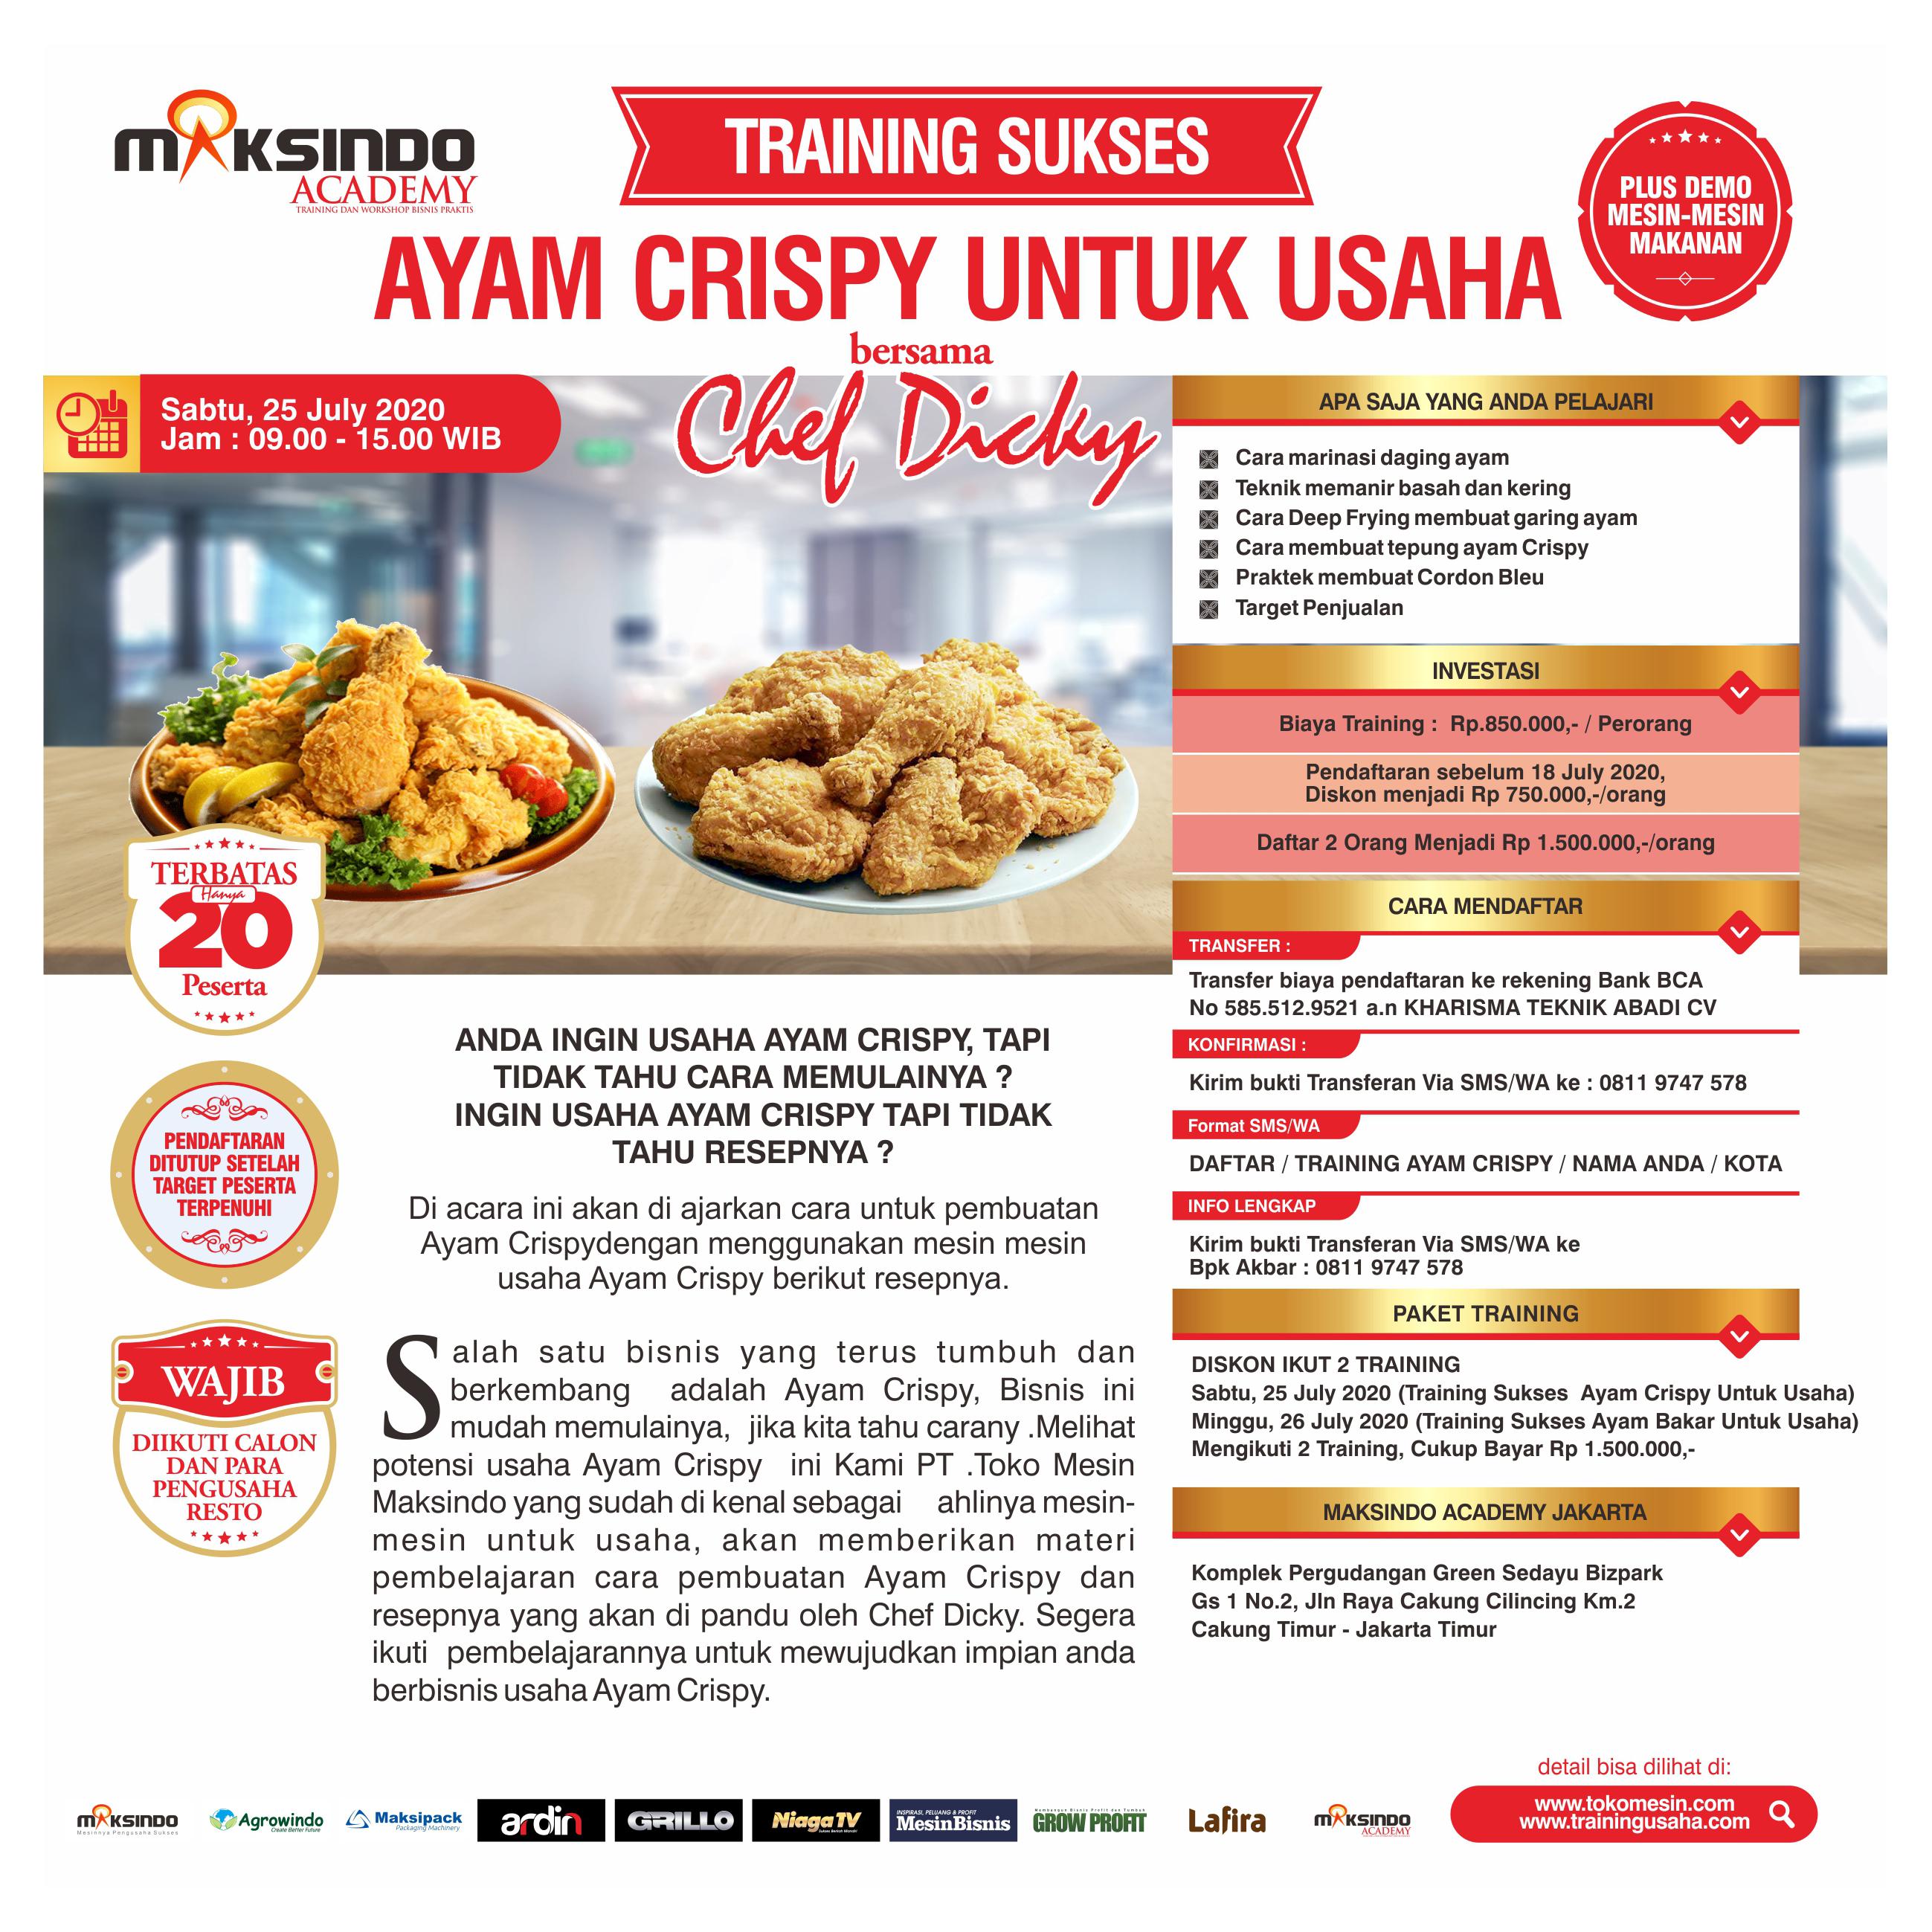 Training Sukses Ayam Crispy Untuk Usaha Sabtu, 25 July 2020